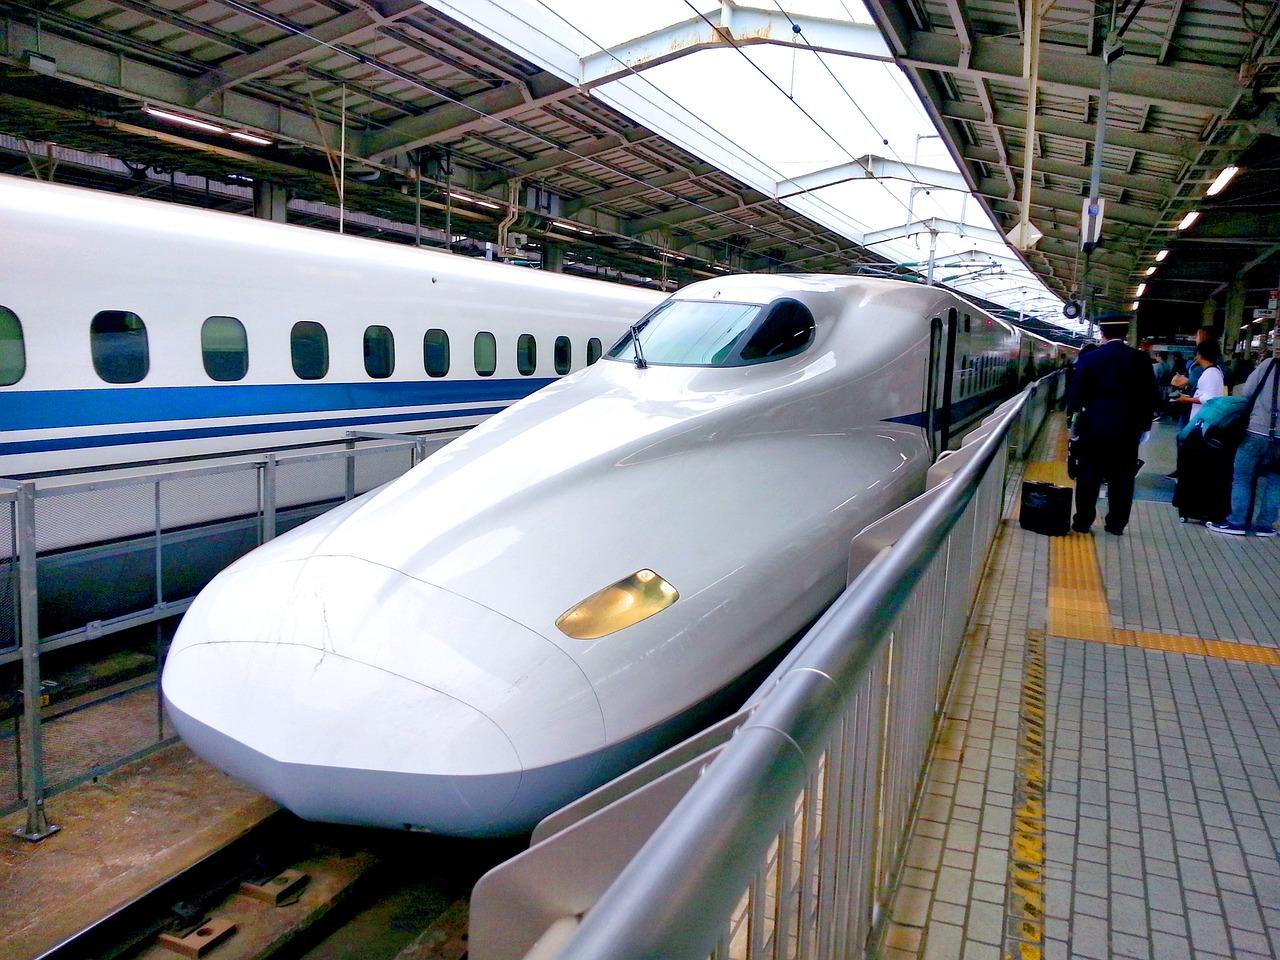 bullet-train-1540467_1280.jpg